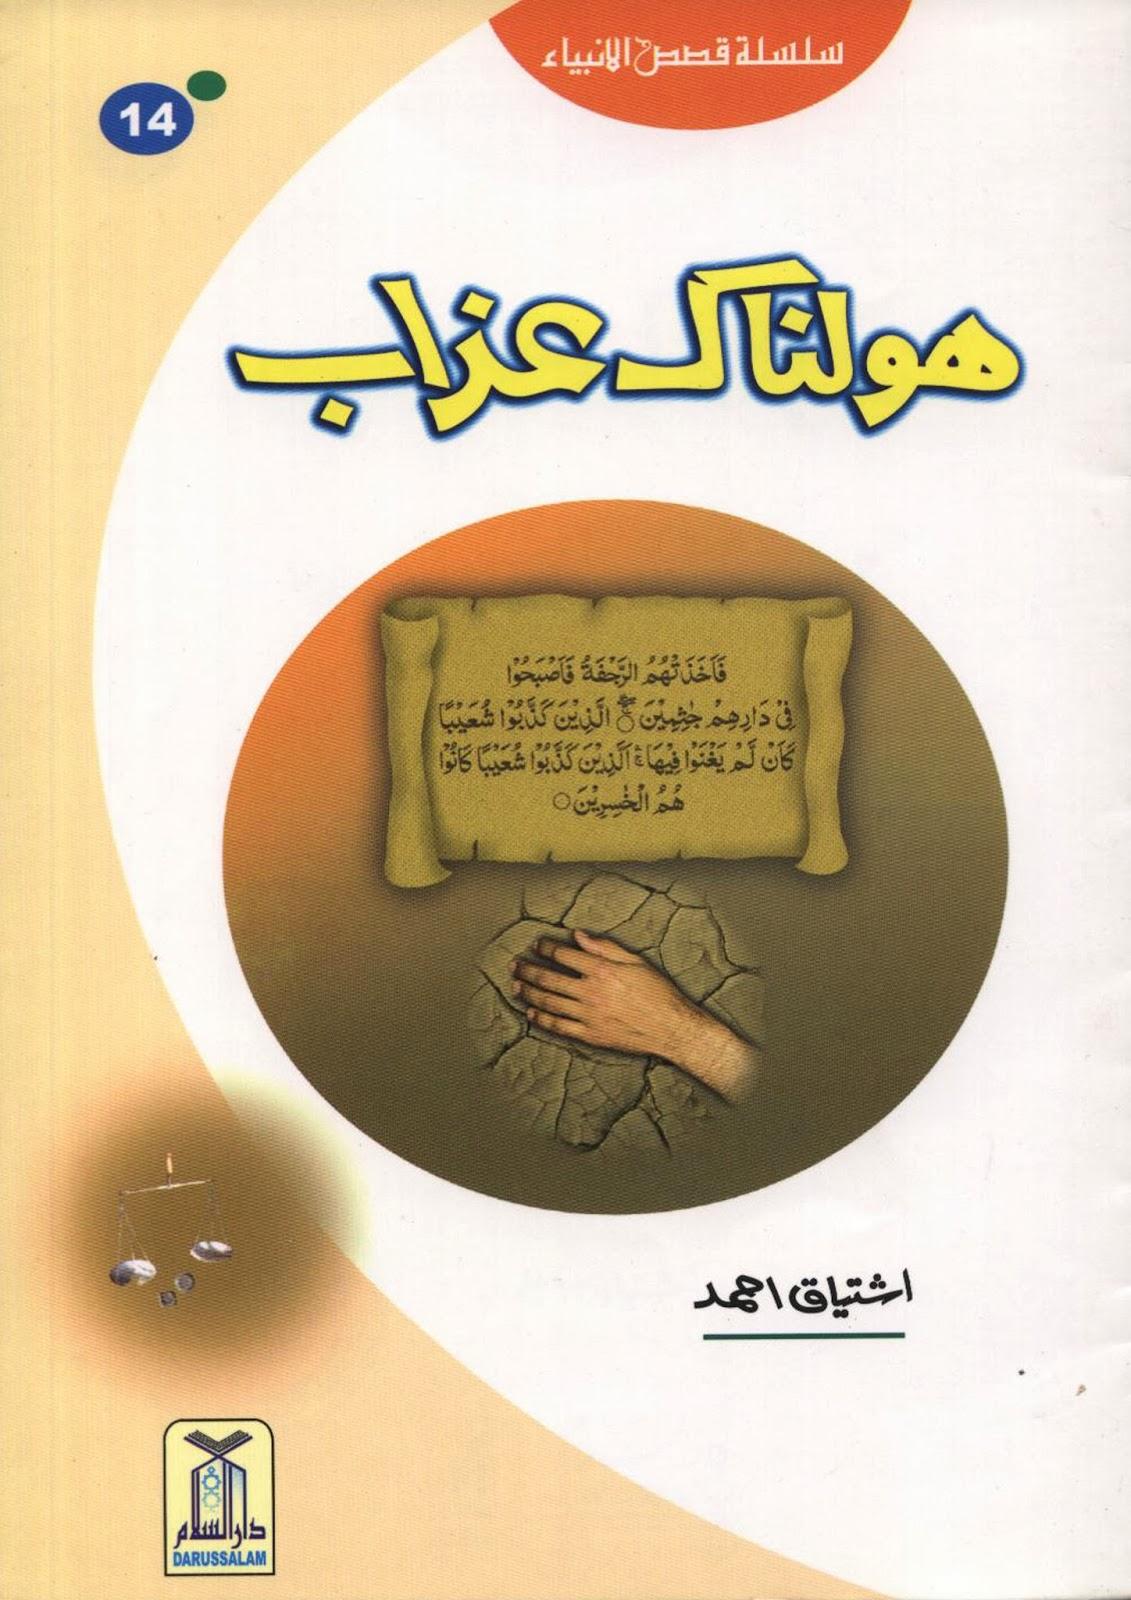 http://urduguru1.blogspot.com/2014/03/holnak-azaab-prophet-shoaib-as.html